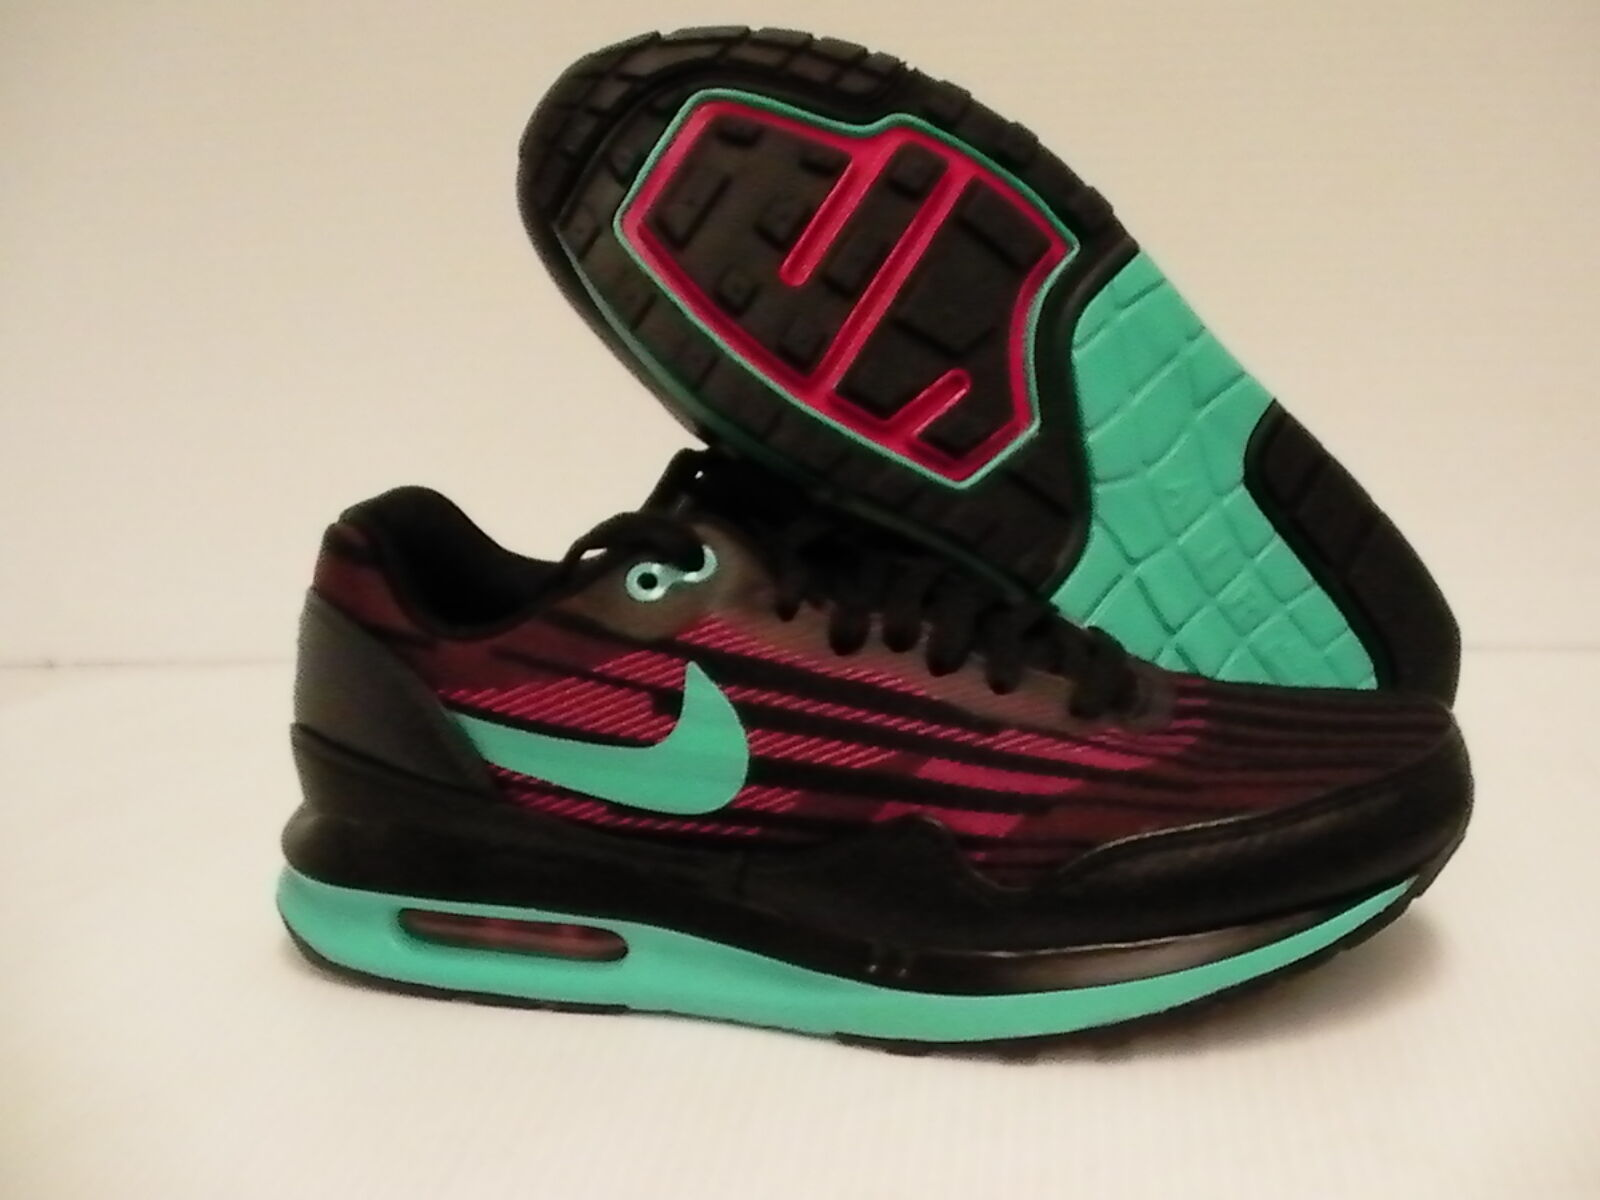 Nike air max running shoes Lunarlon size 8 us men